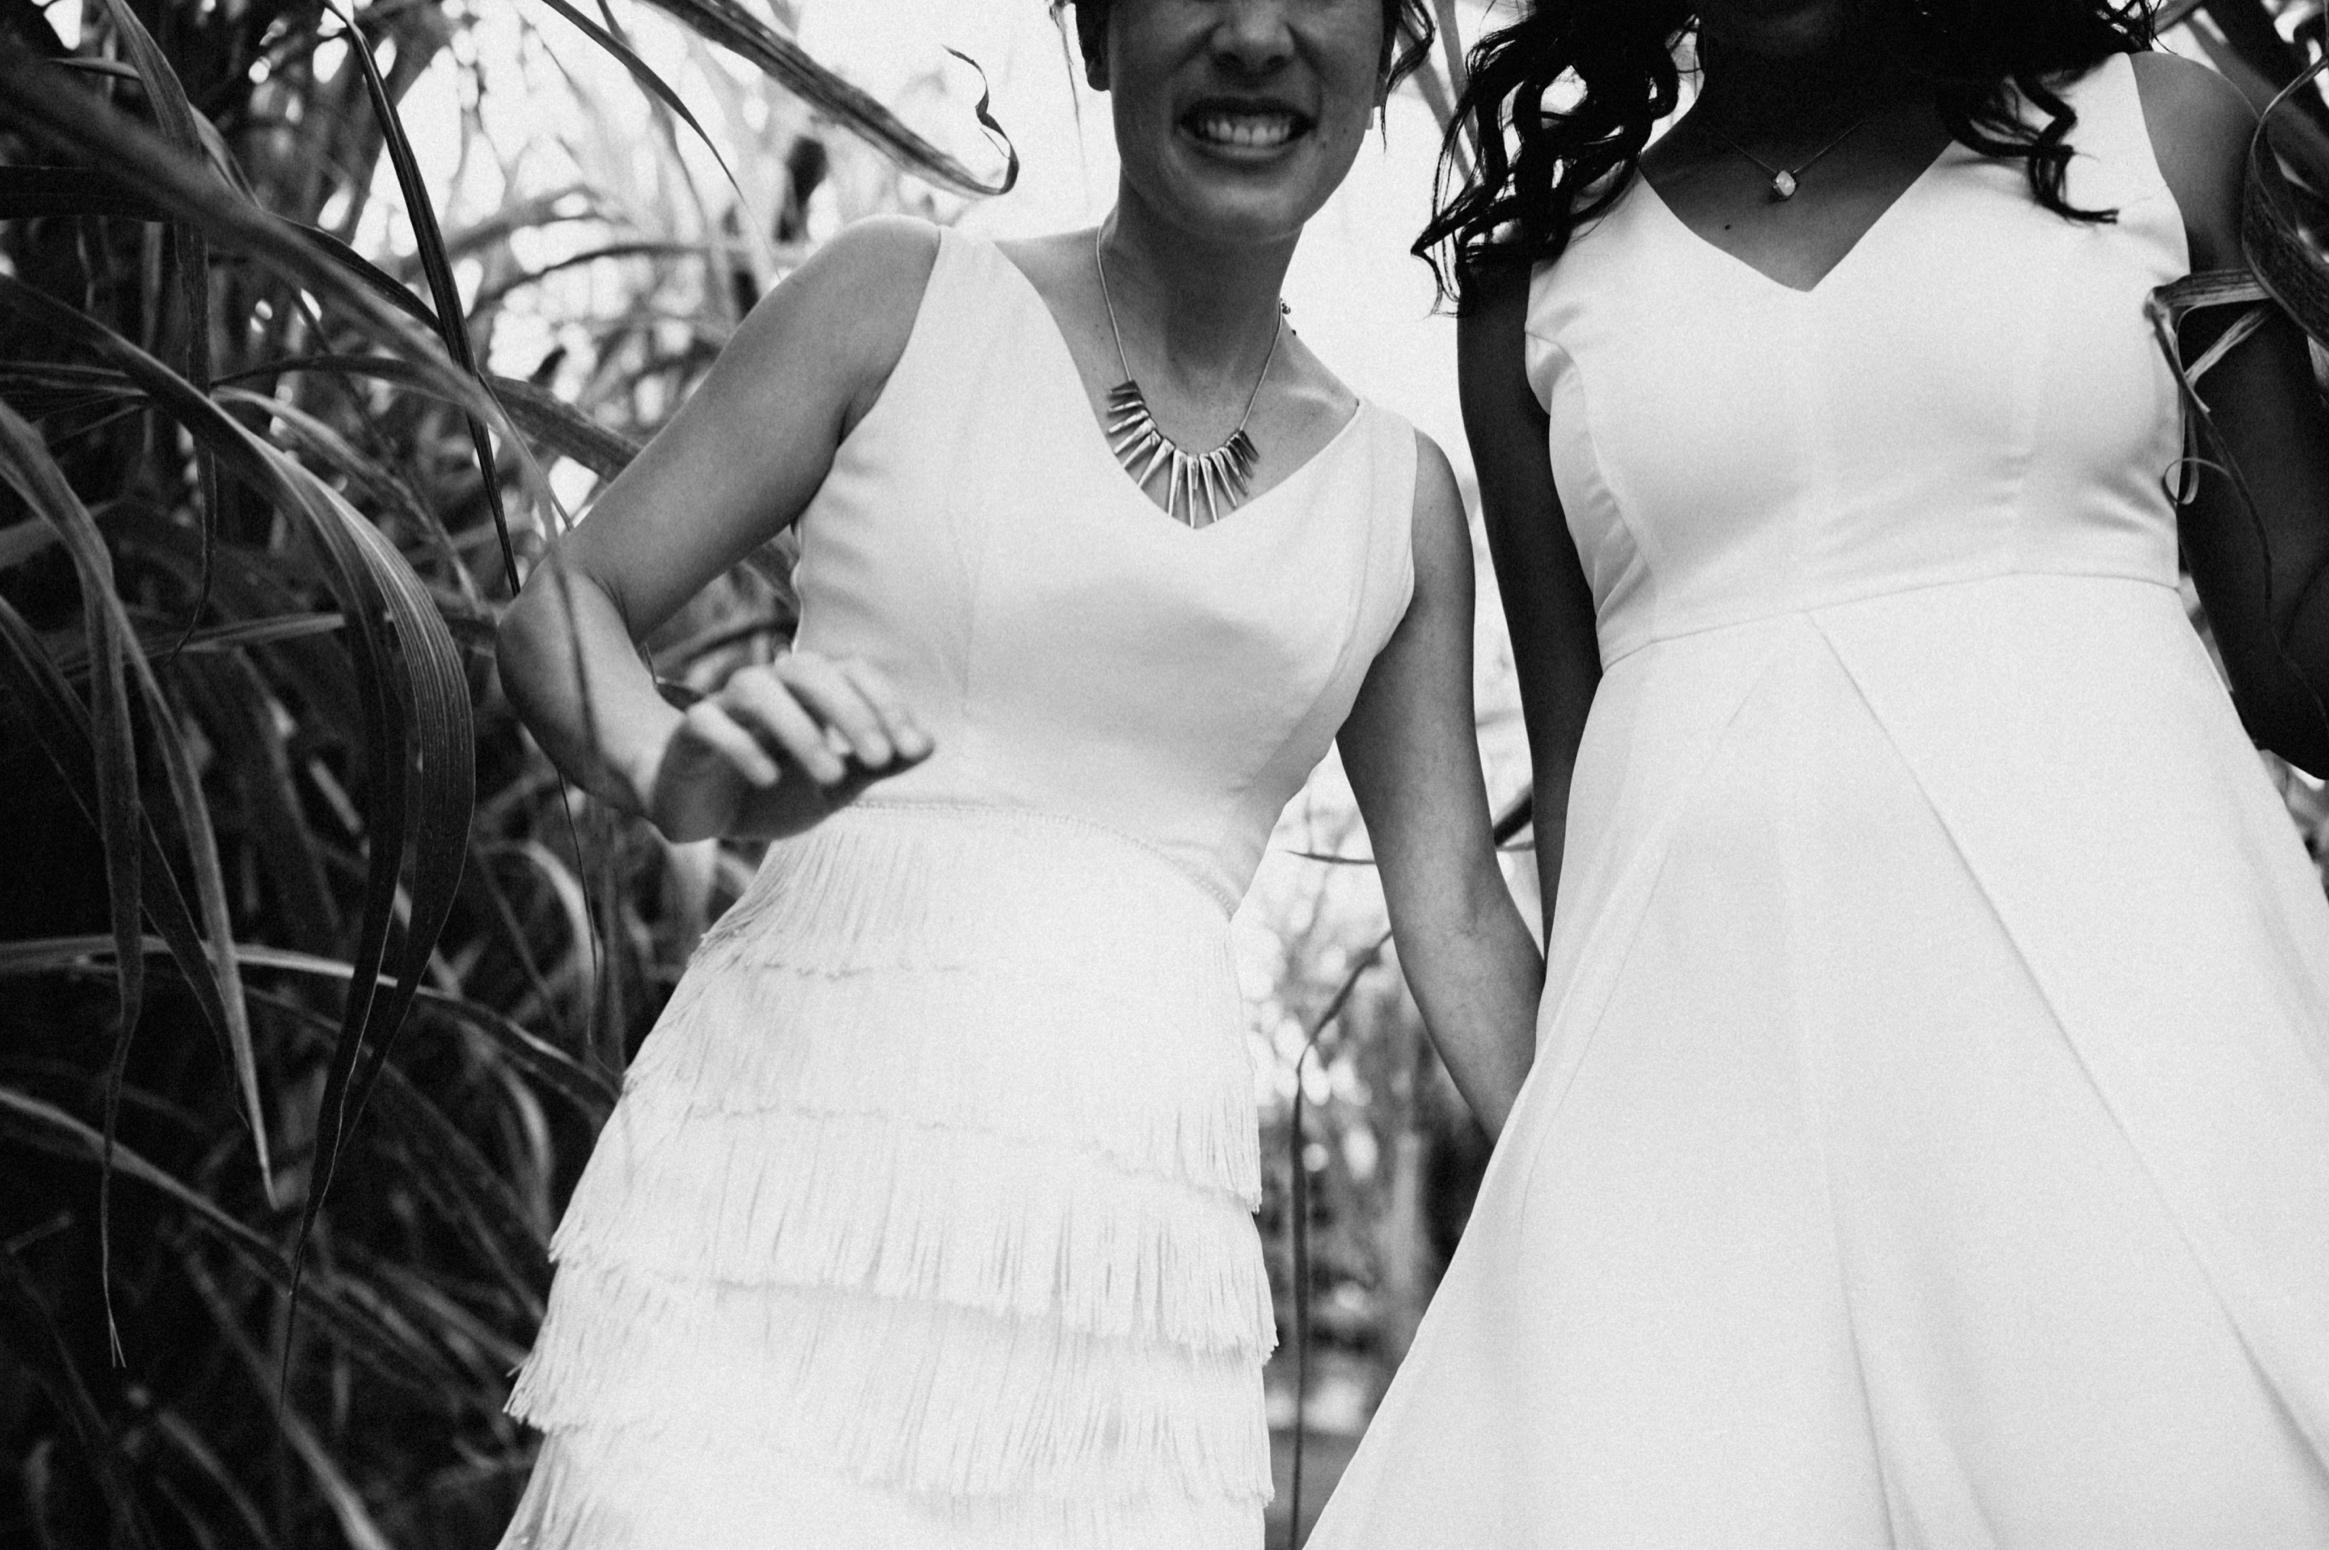 20_Oahu Hawaii Wedding  (58 of 294)_Oahu_sex_Hawaii_same_wedding_elopement_photographer.jpg